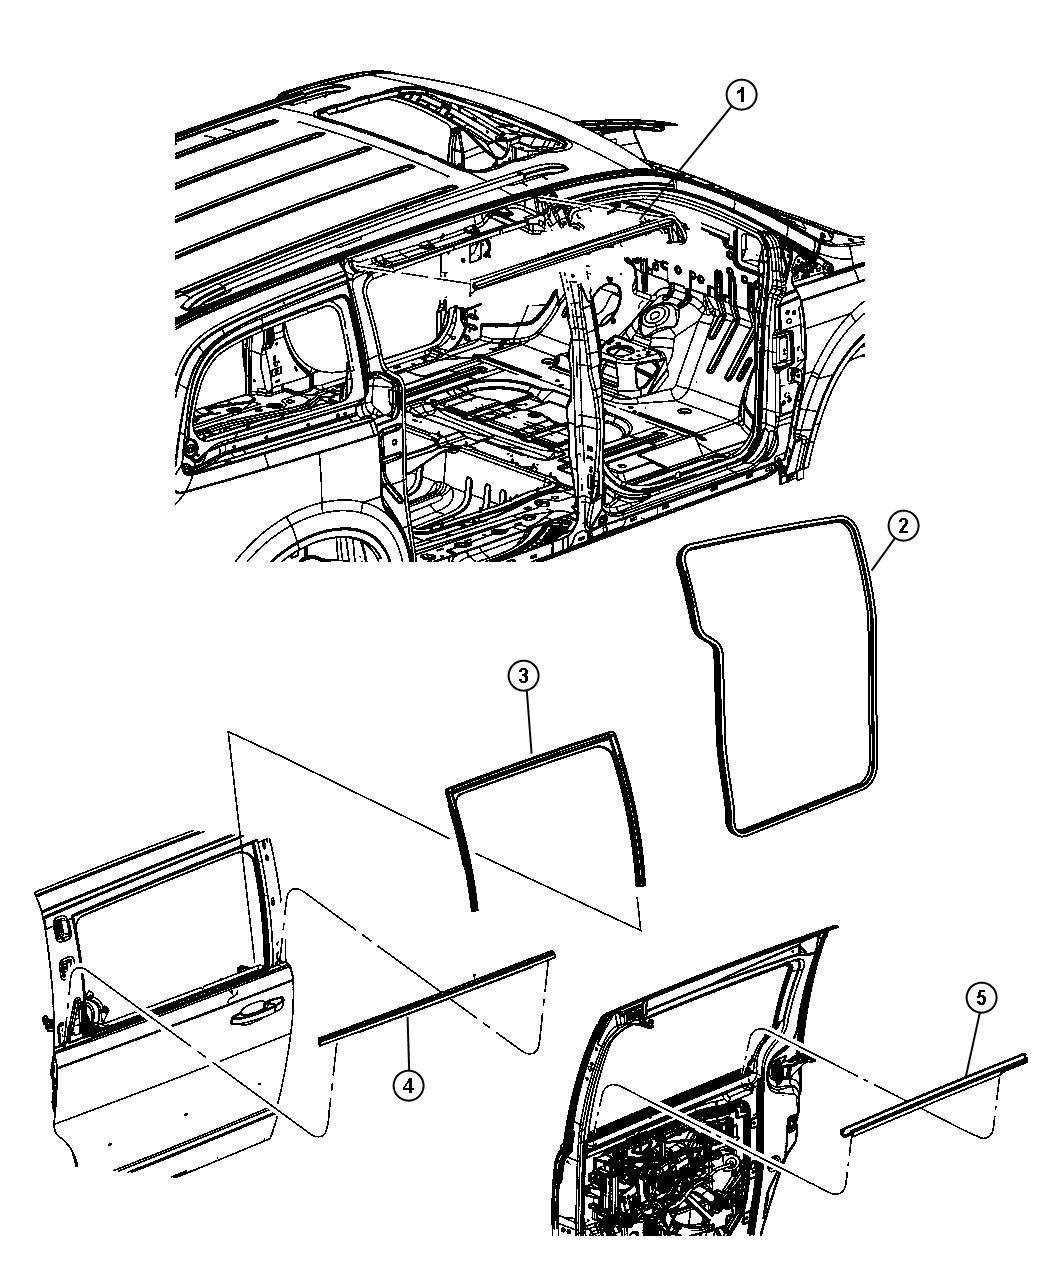 Wiring Diagram Chrysler Town Country Sliding Doors